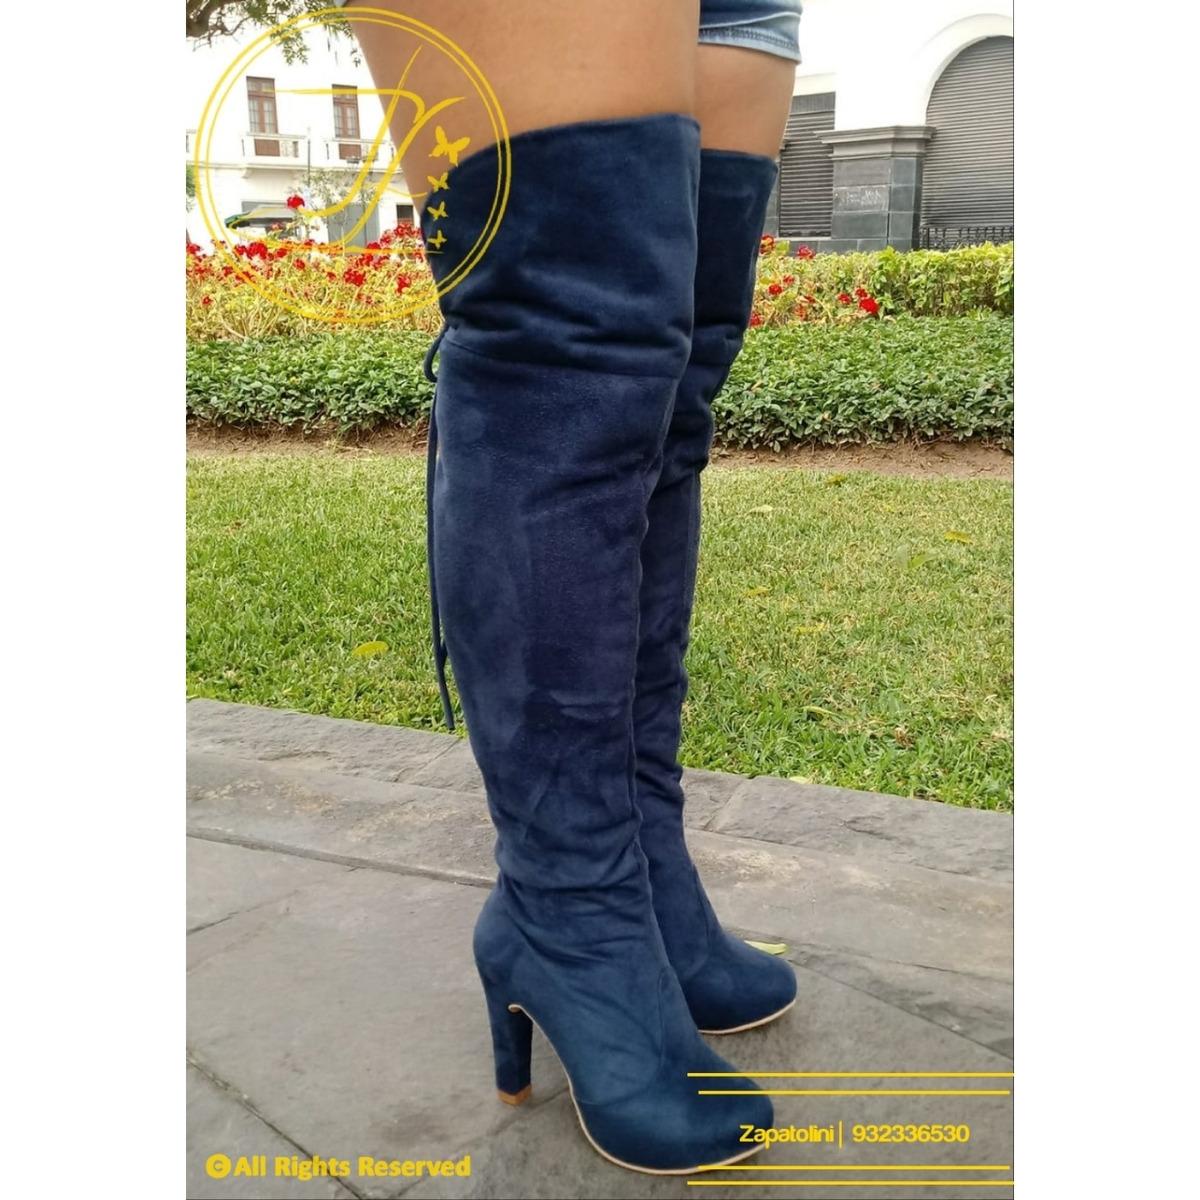 b562ffecb2 zapatos mujer botas adelanto temporada otoño-invierno 2019. Cargando zoom.